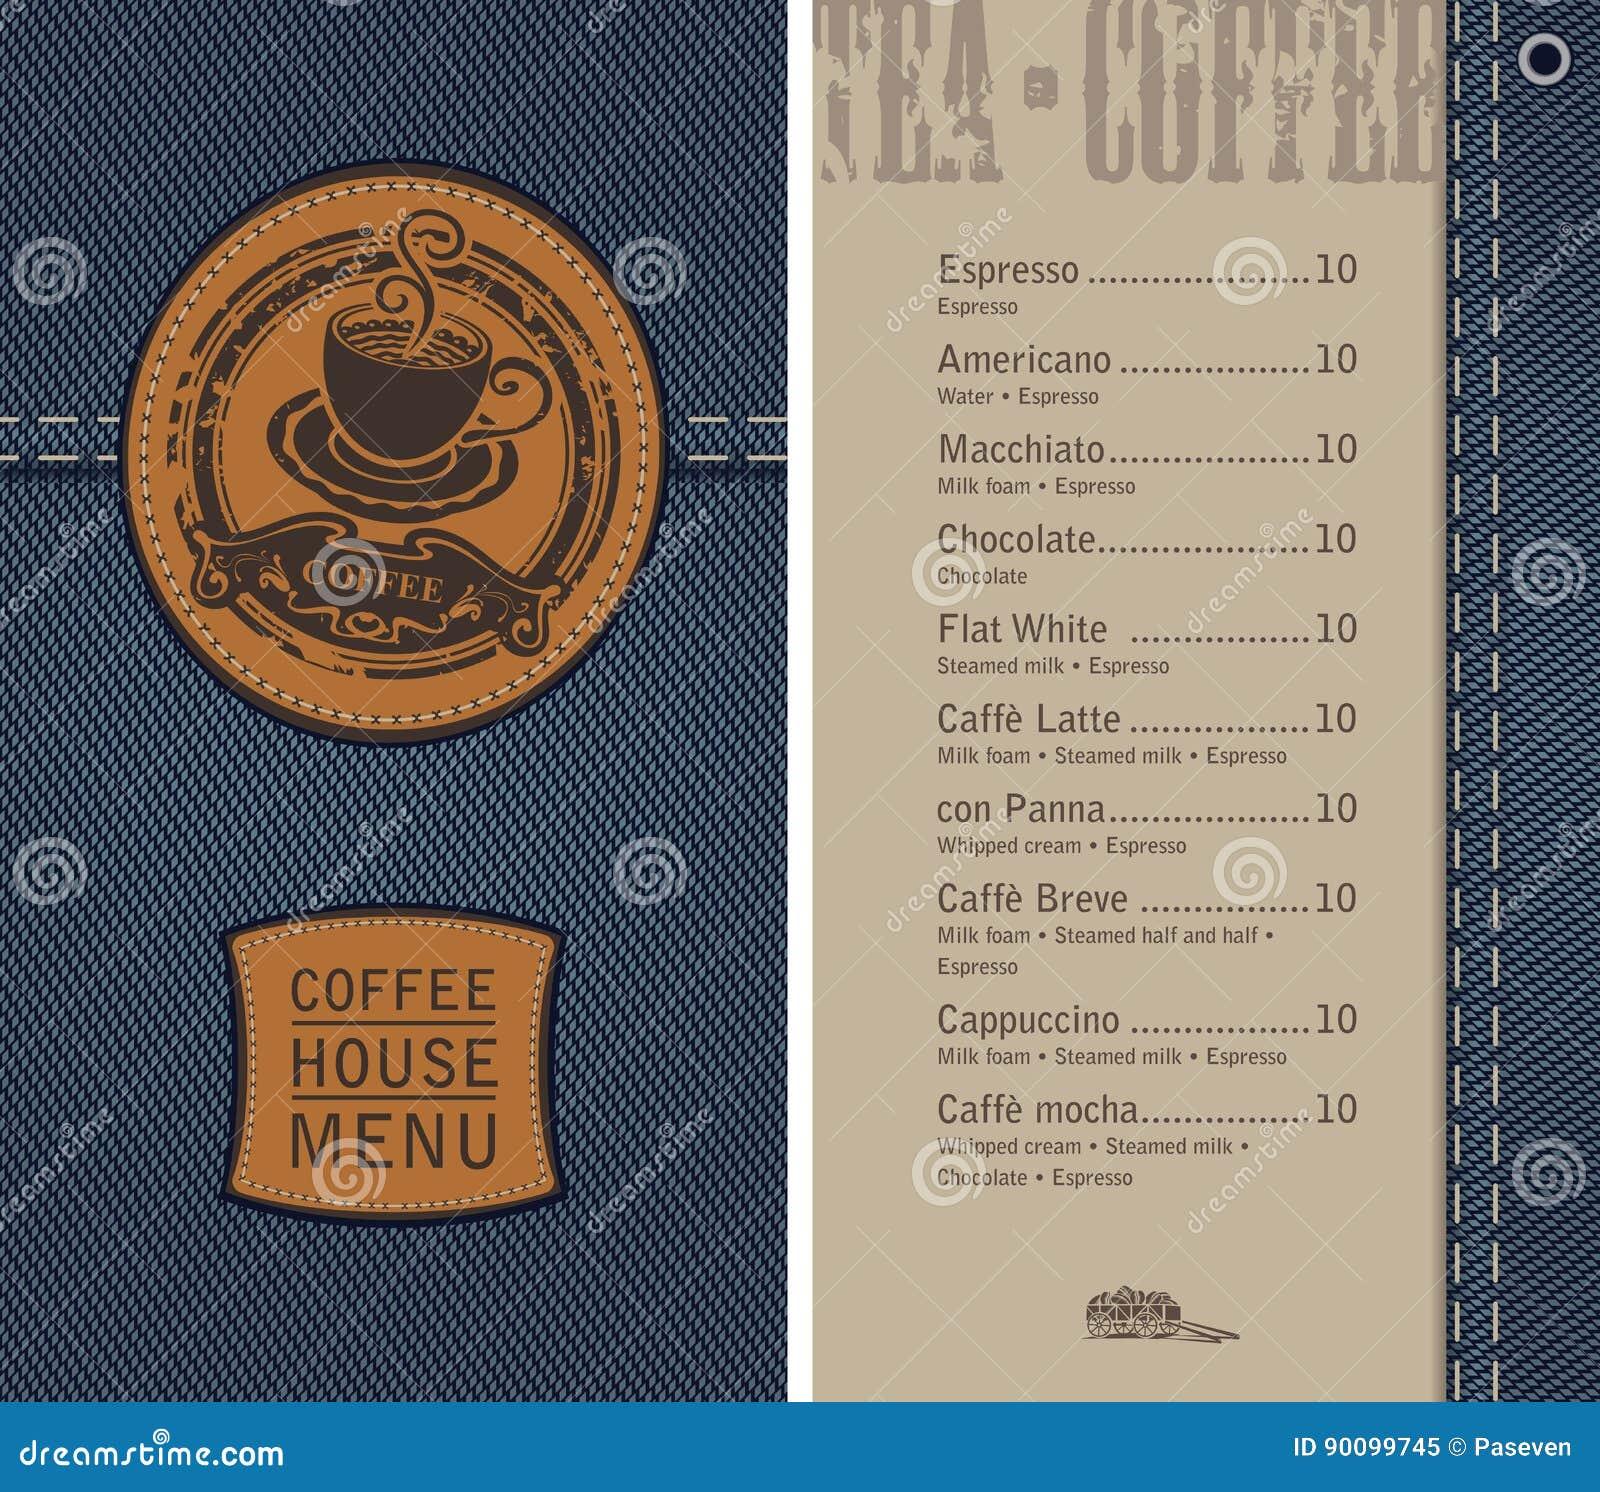 Coffee House Menu On Denim Background With Price Cartoon